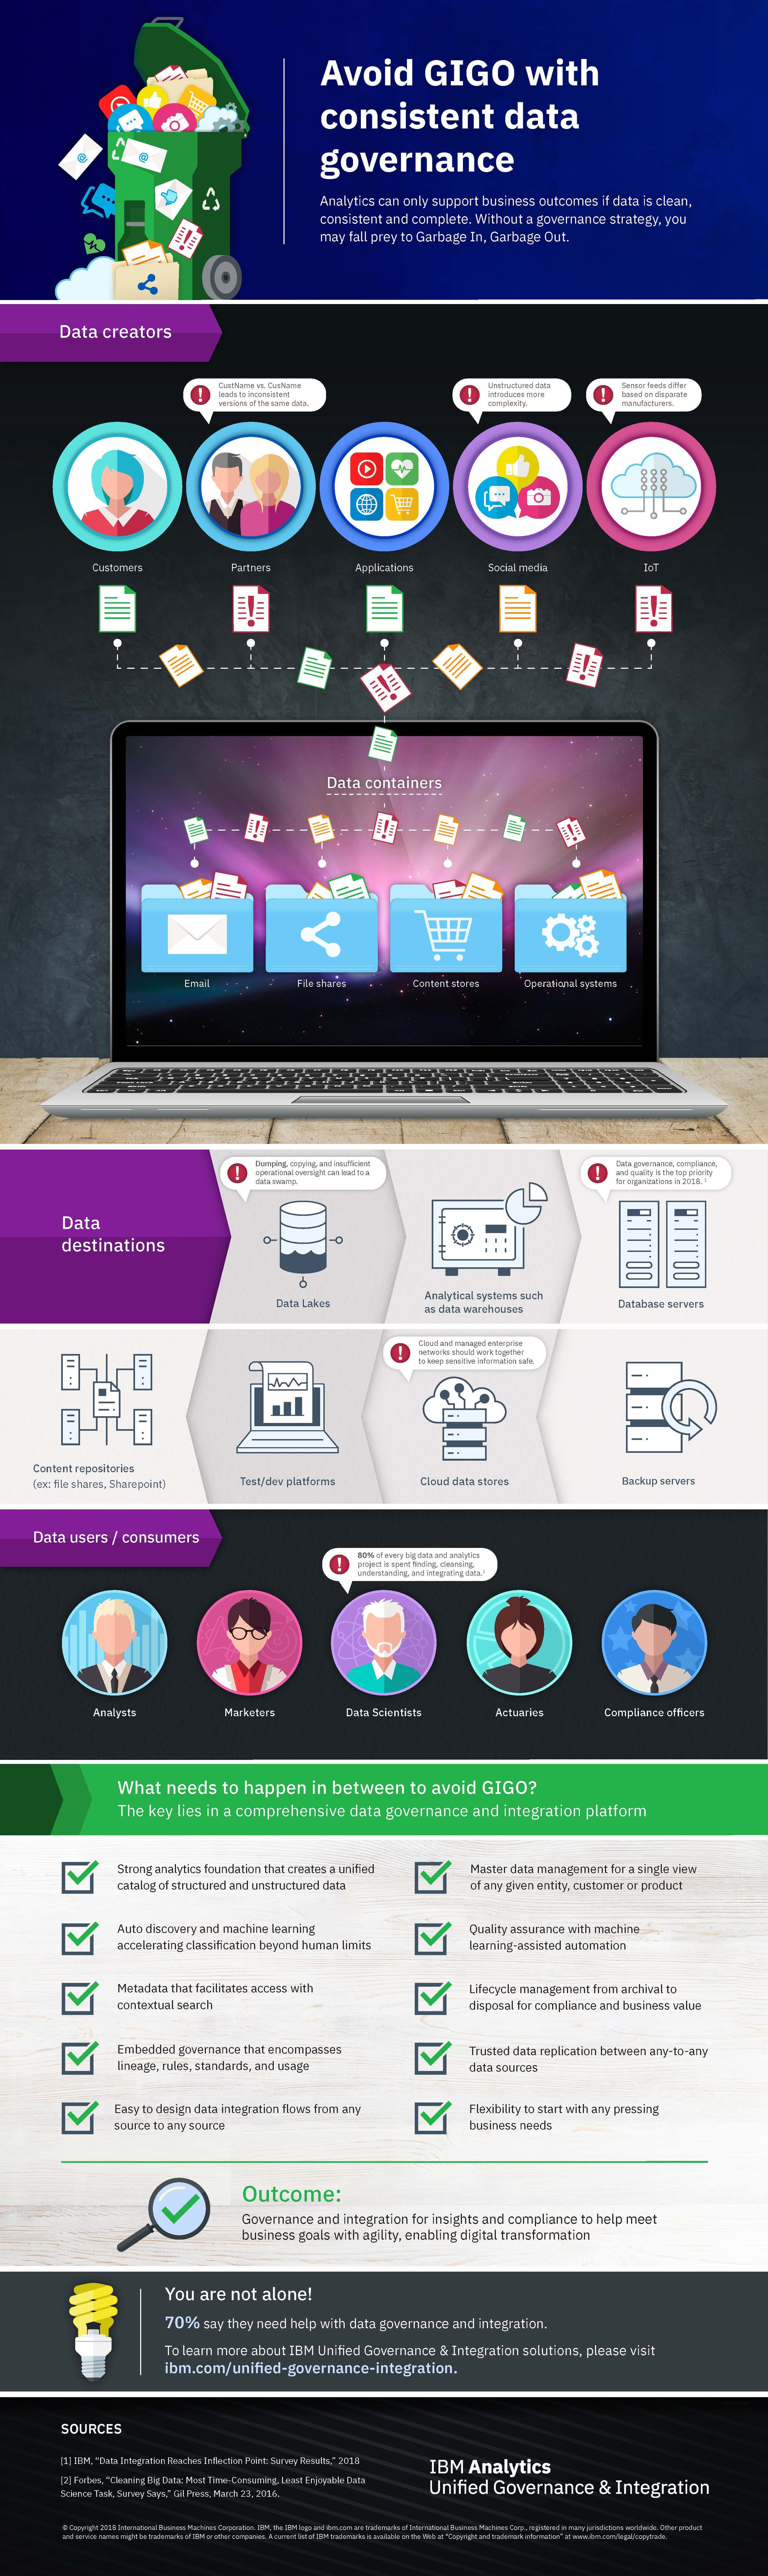 CBSi_Studio61_IBM_Unified_Governance_Integration_Infographic_R3.jpg